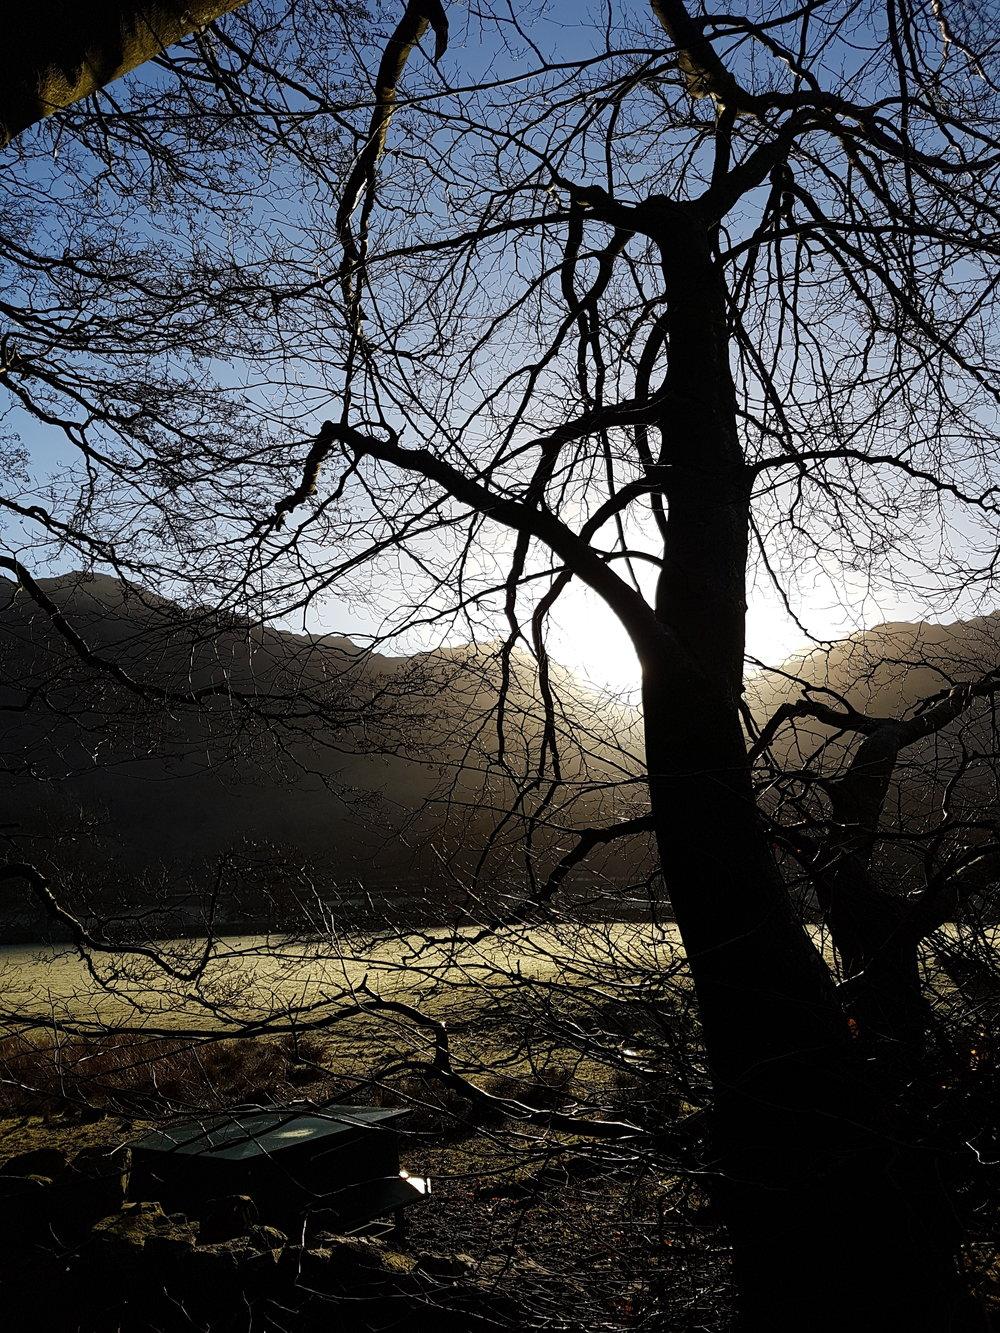 Winter morning in Seatoller, Cumbria